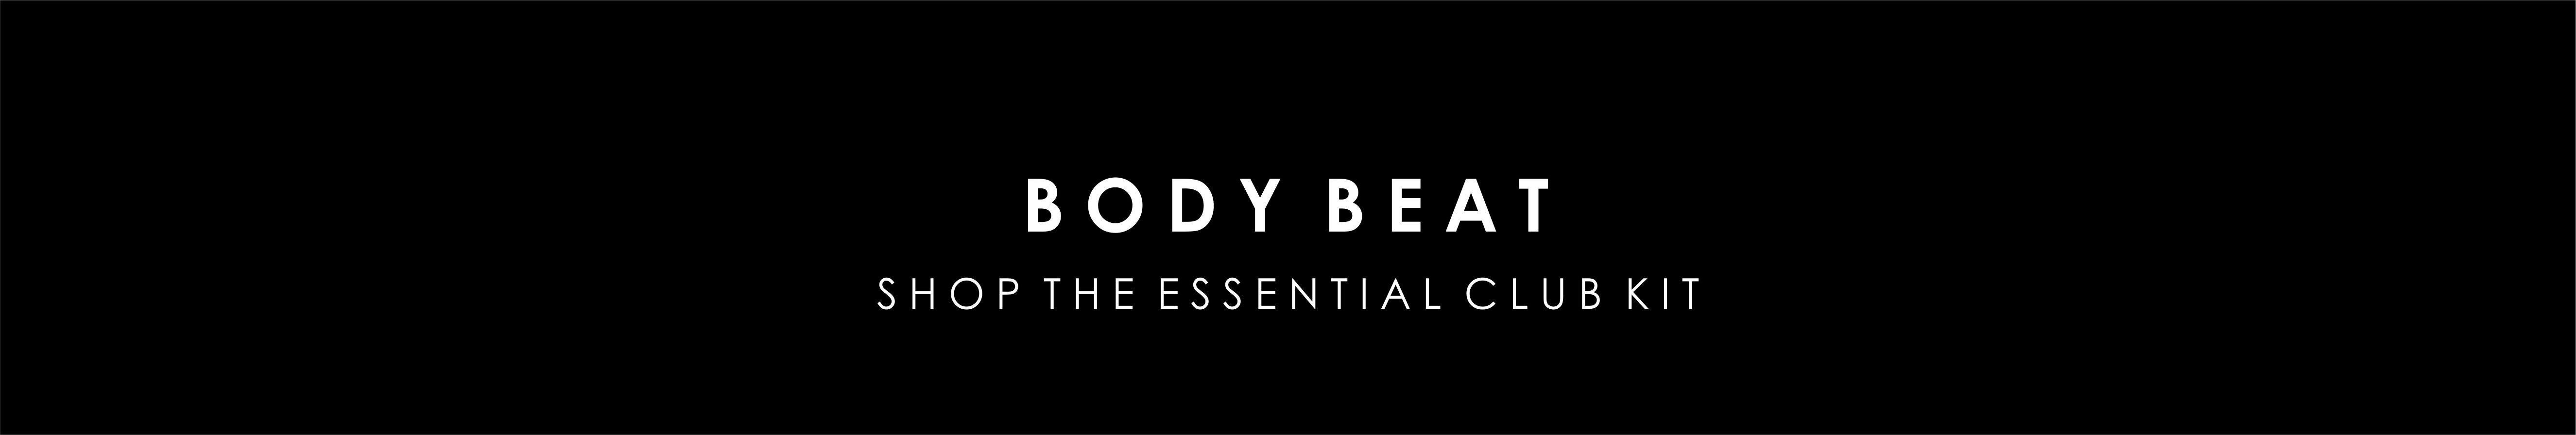 body-beat-banner.jpg